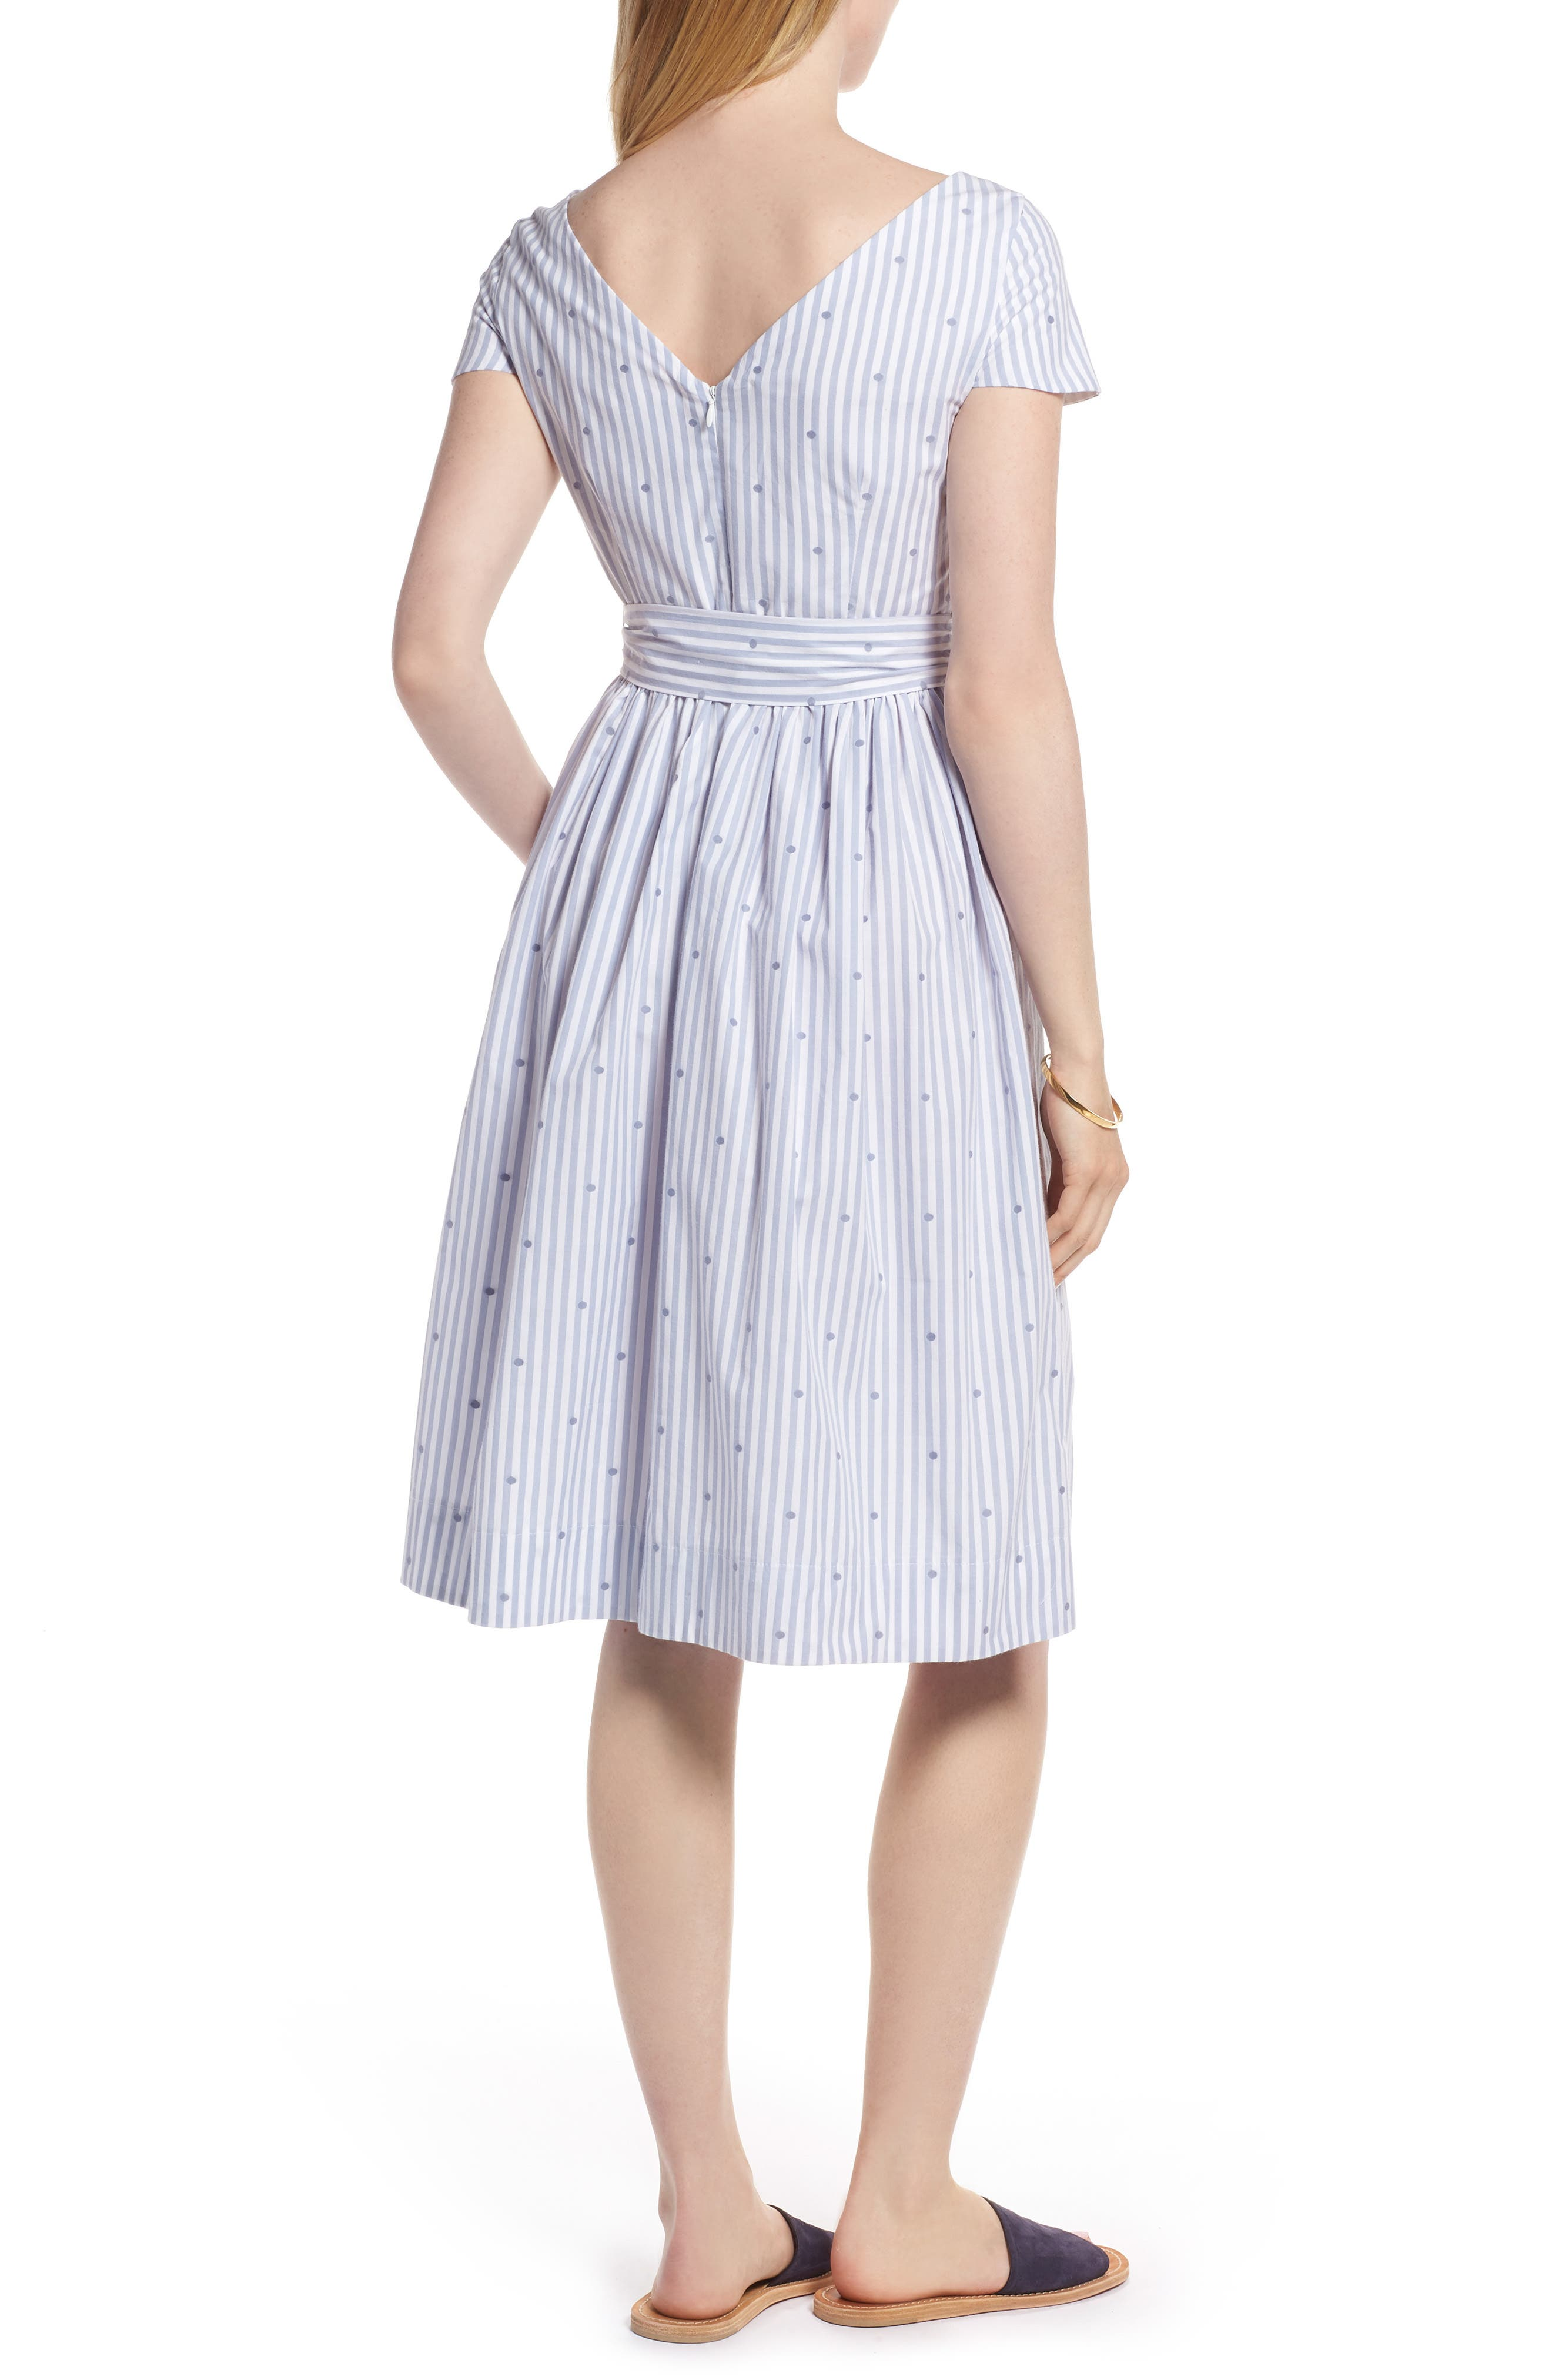 Stripe & Dot Cotton Dress,                             Alternate thumbnail 2, color,                             Eve Dot Stripe